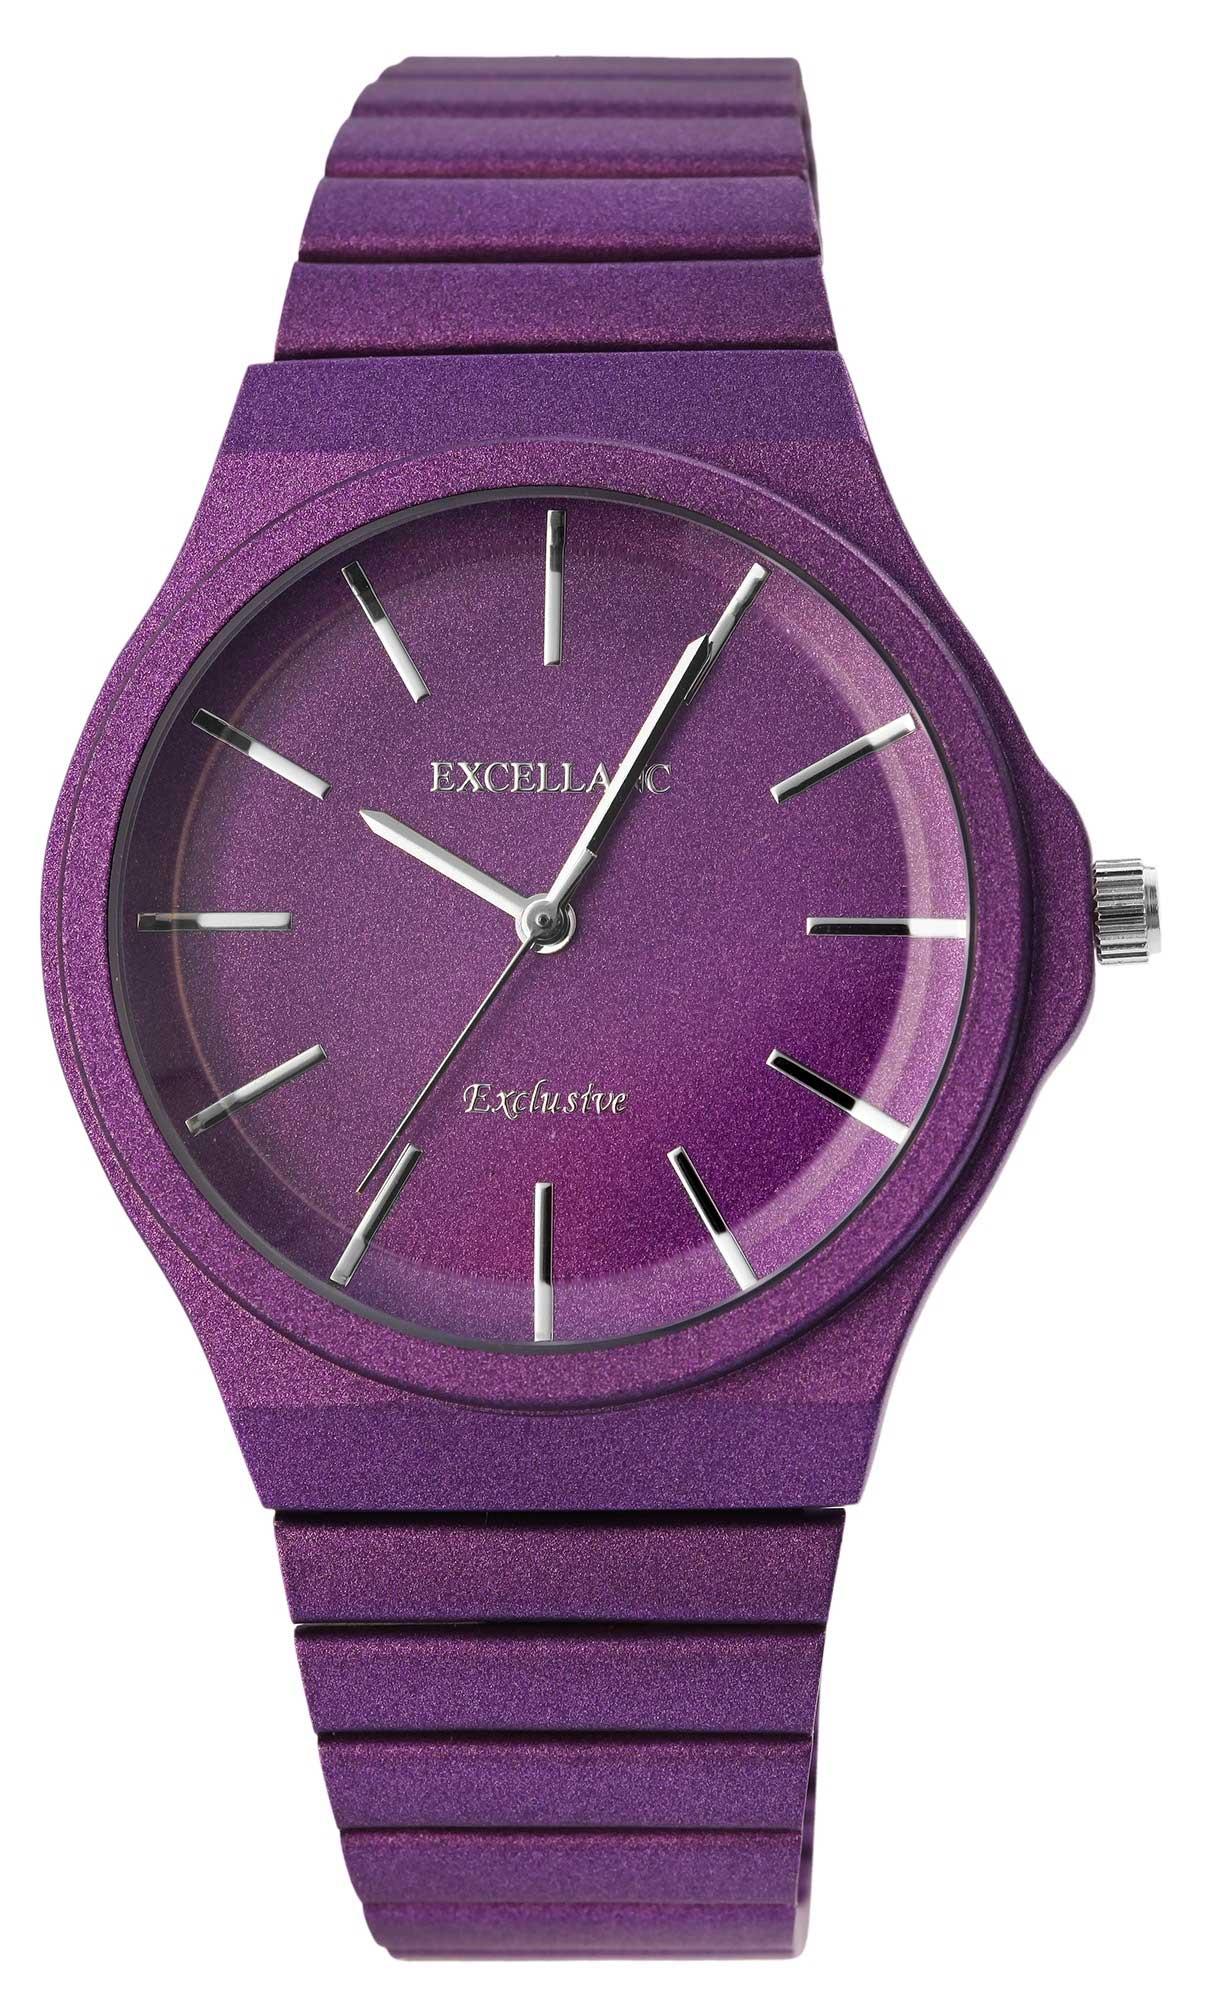 Damenuhr Armbanduhr Excellanc analog Uhr Lila